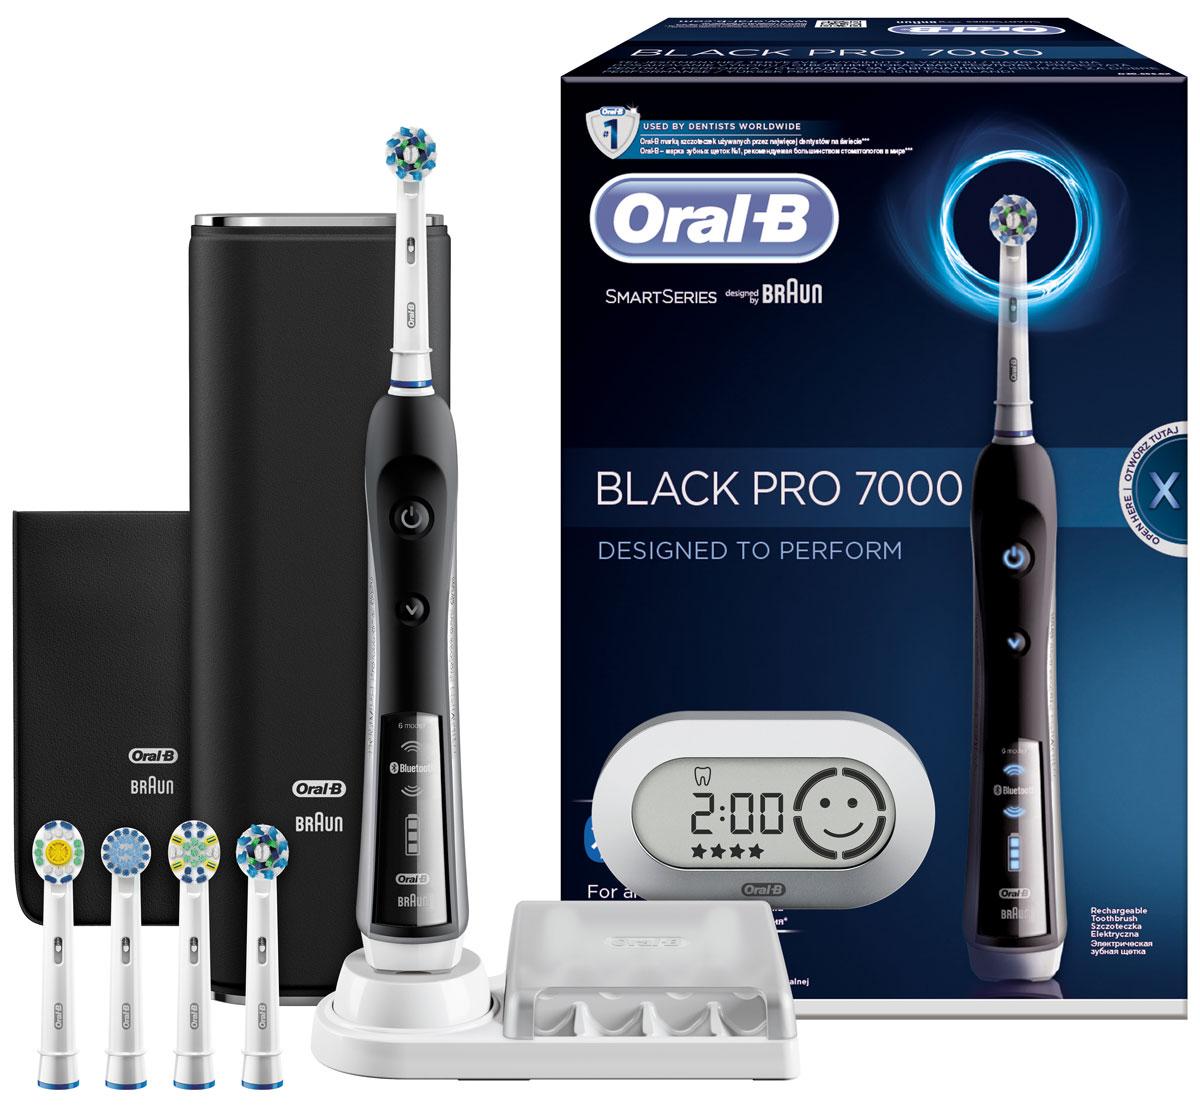 Oral-B Black 7000 CrossAction Smart Series электрическая зубная щетка с Bluetooth